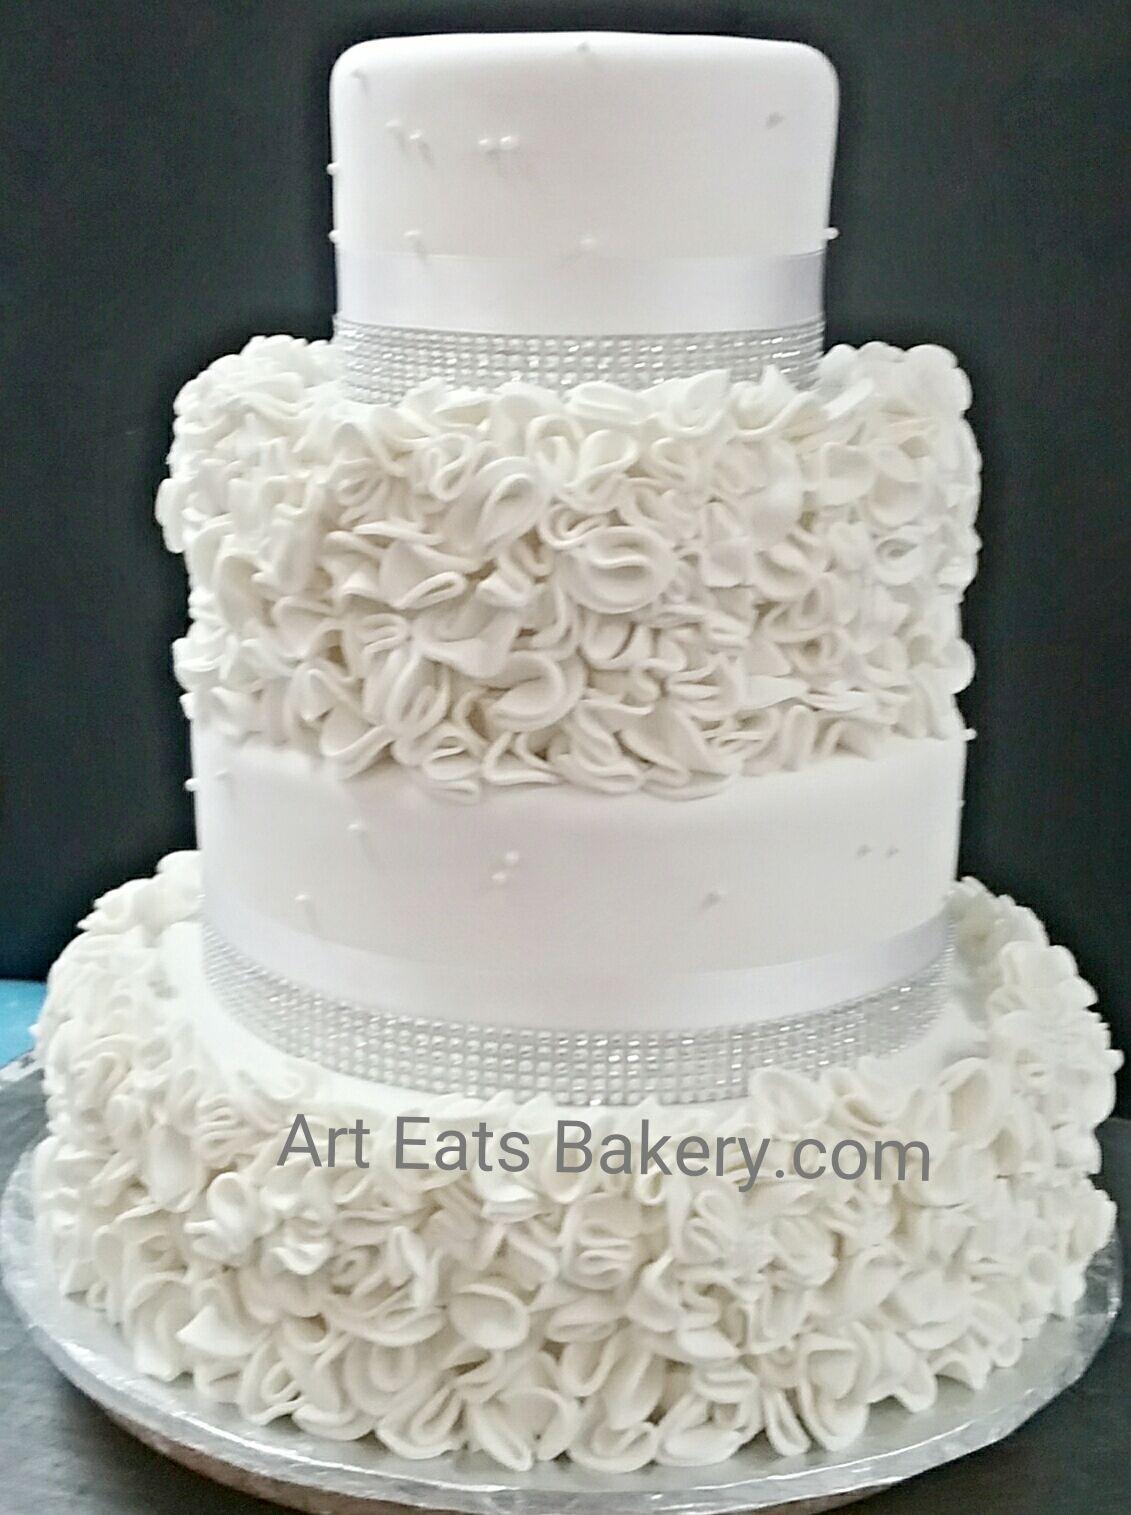 4 Tier Custom White Fondant Modern Elegant Ruffle Design Wedding Cake With Sugar Pearls And Bling